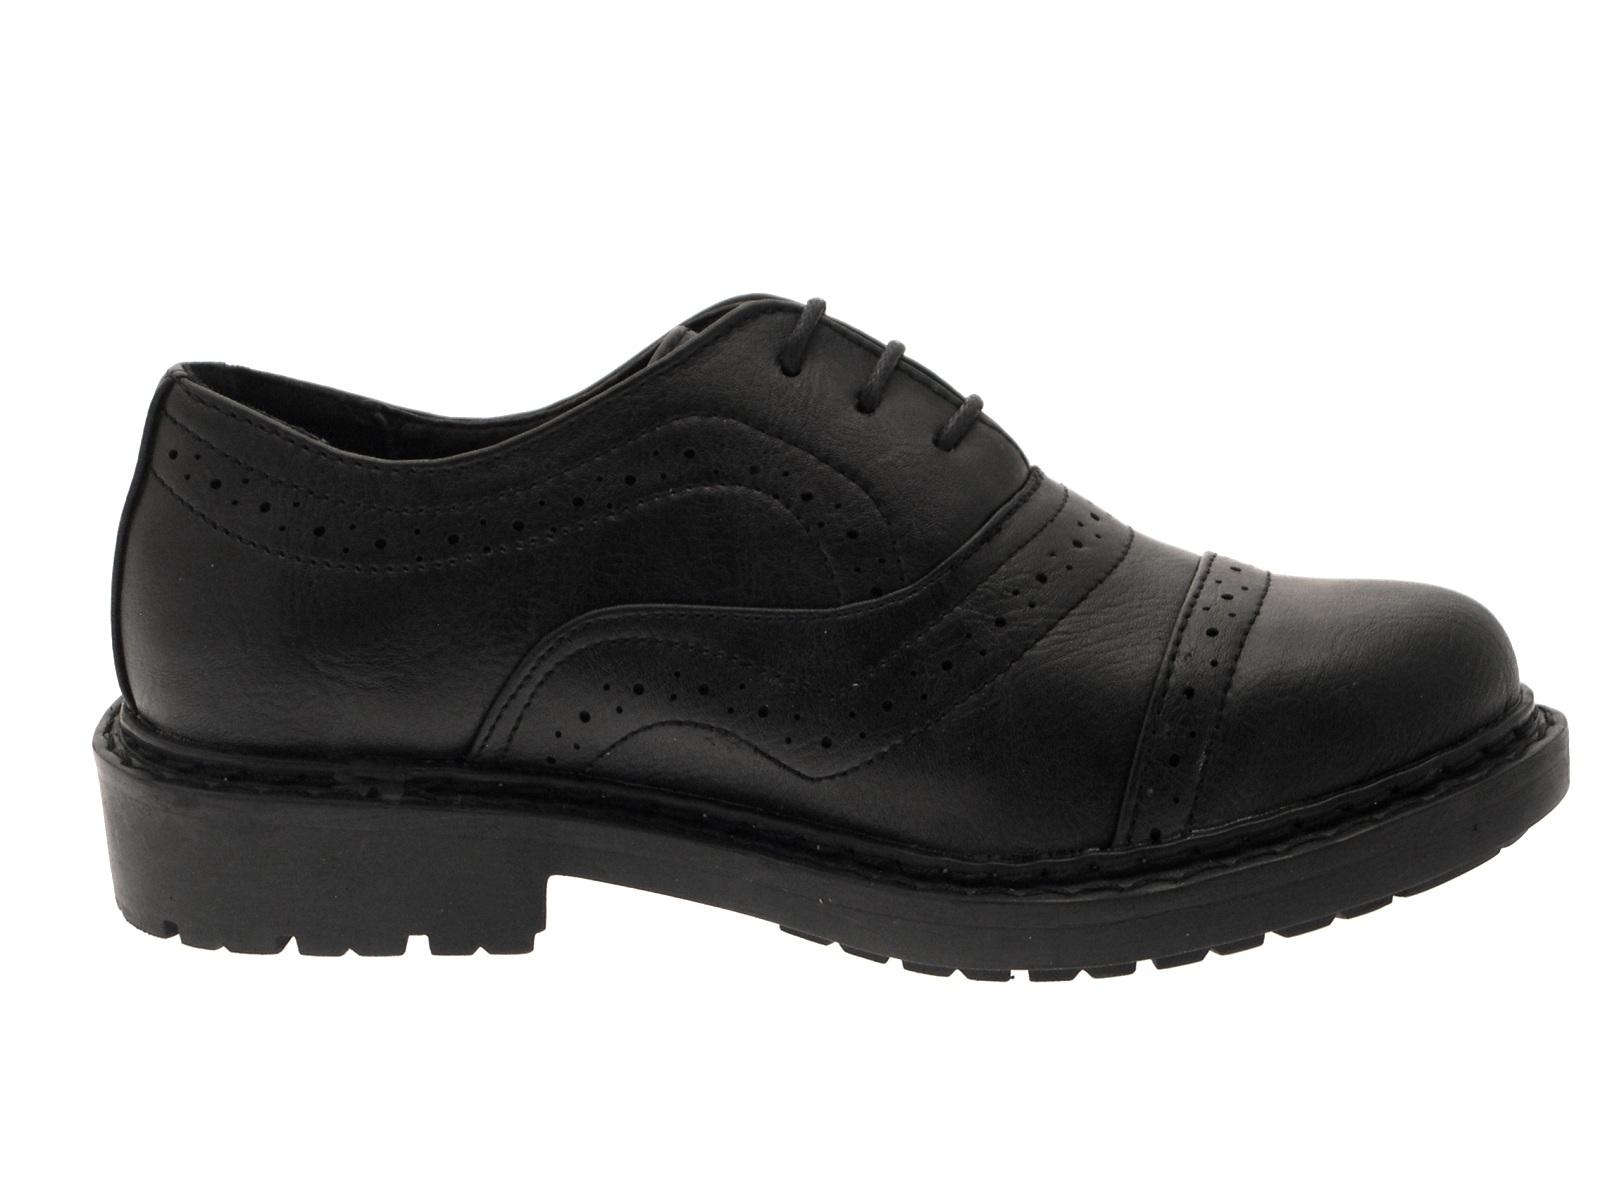 boys black lace up brogue faux leather school shoes